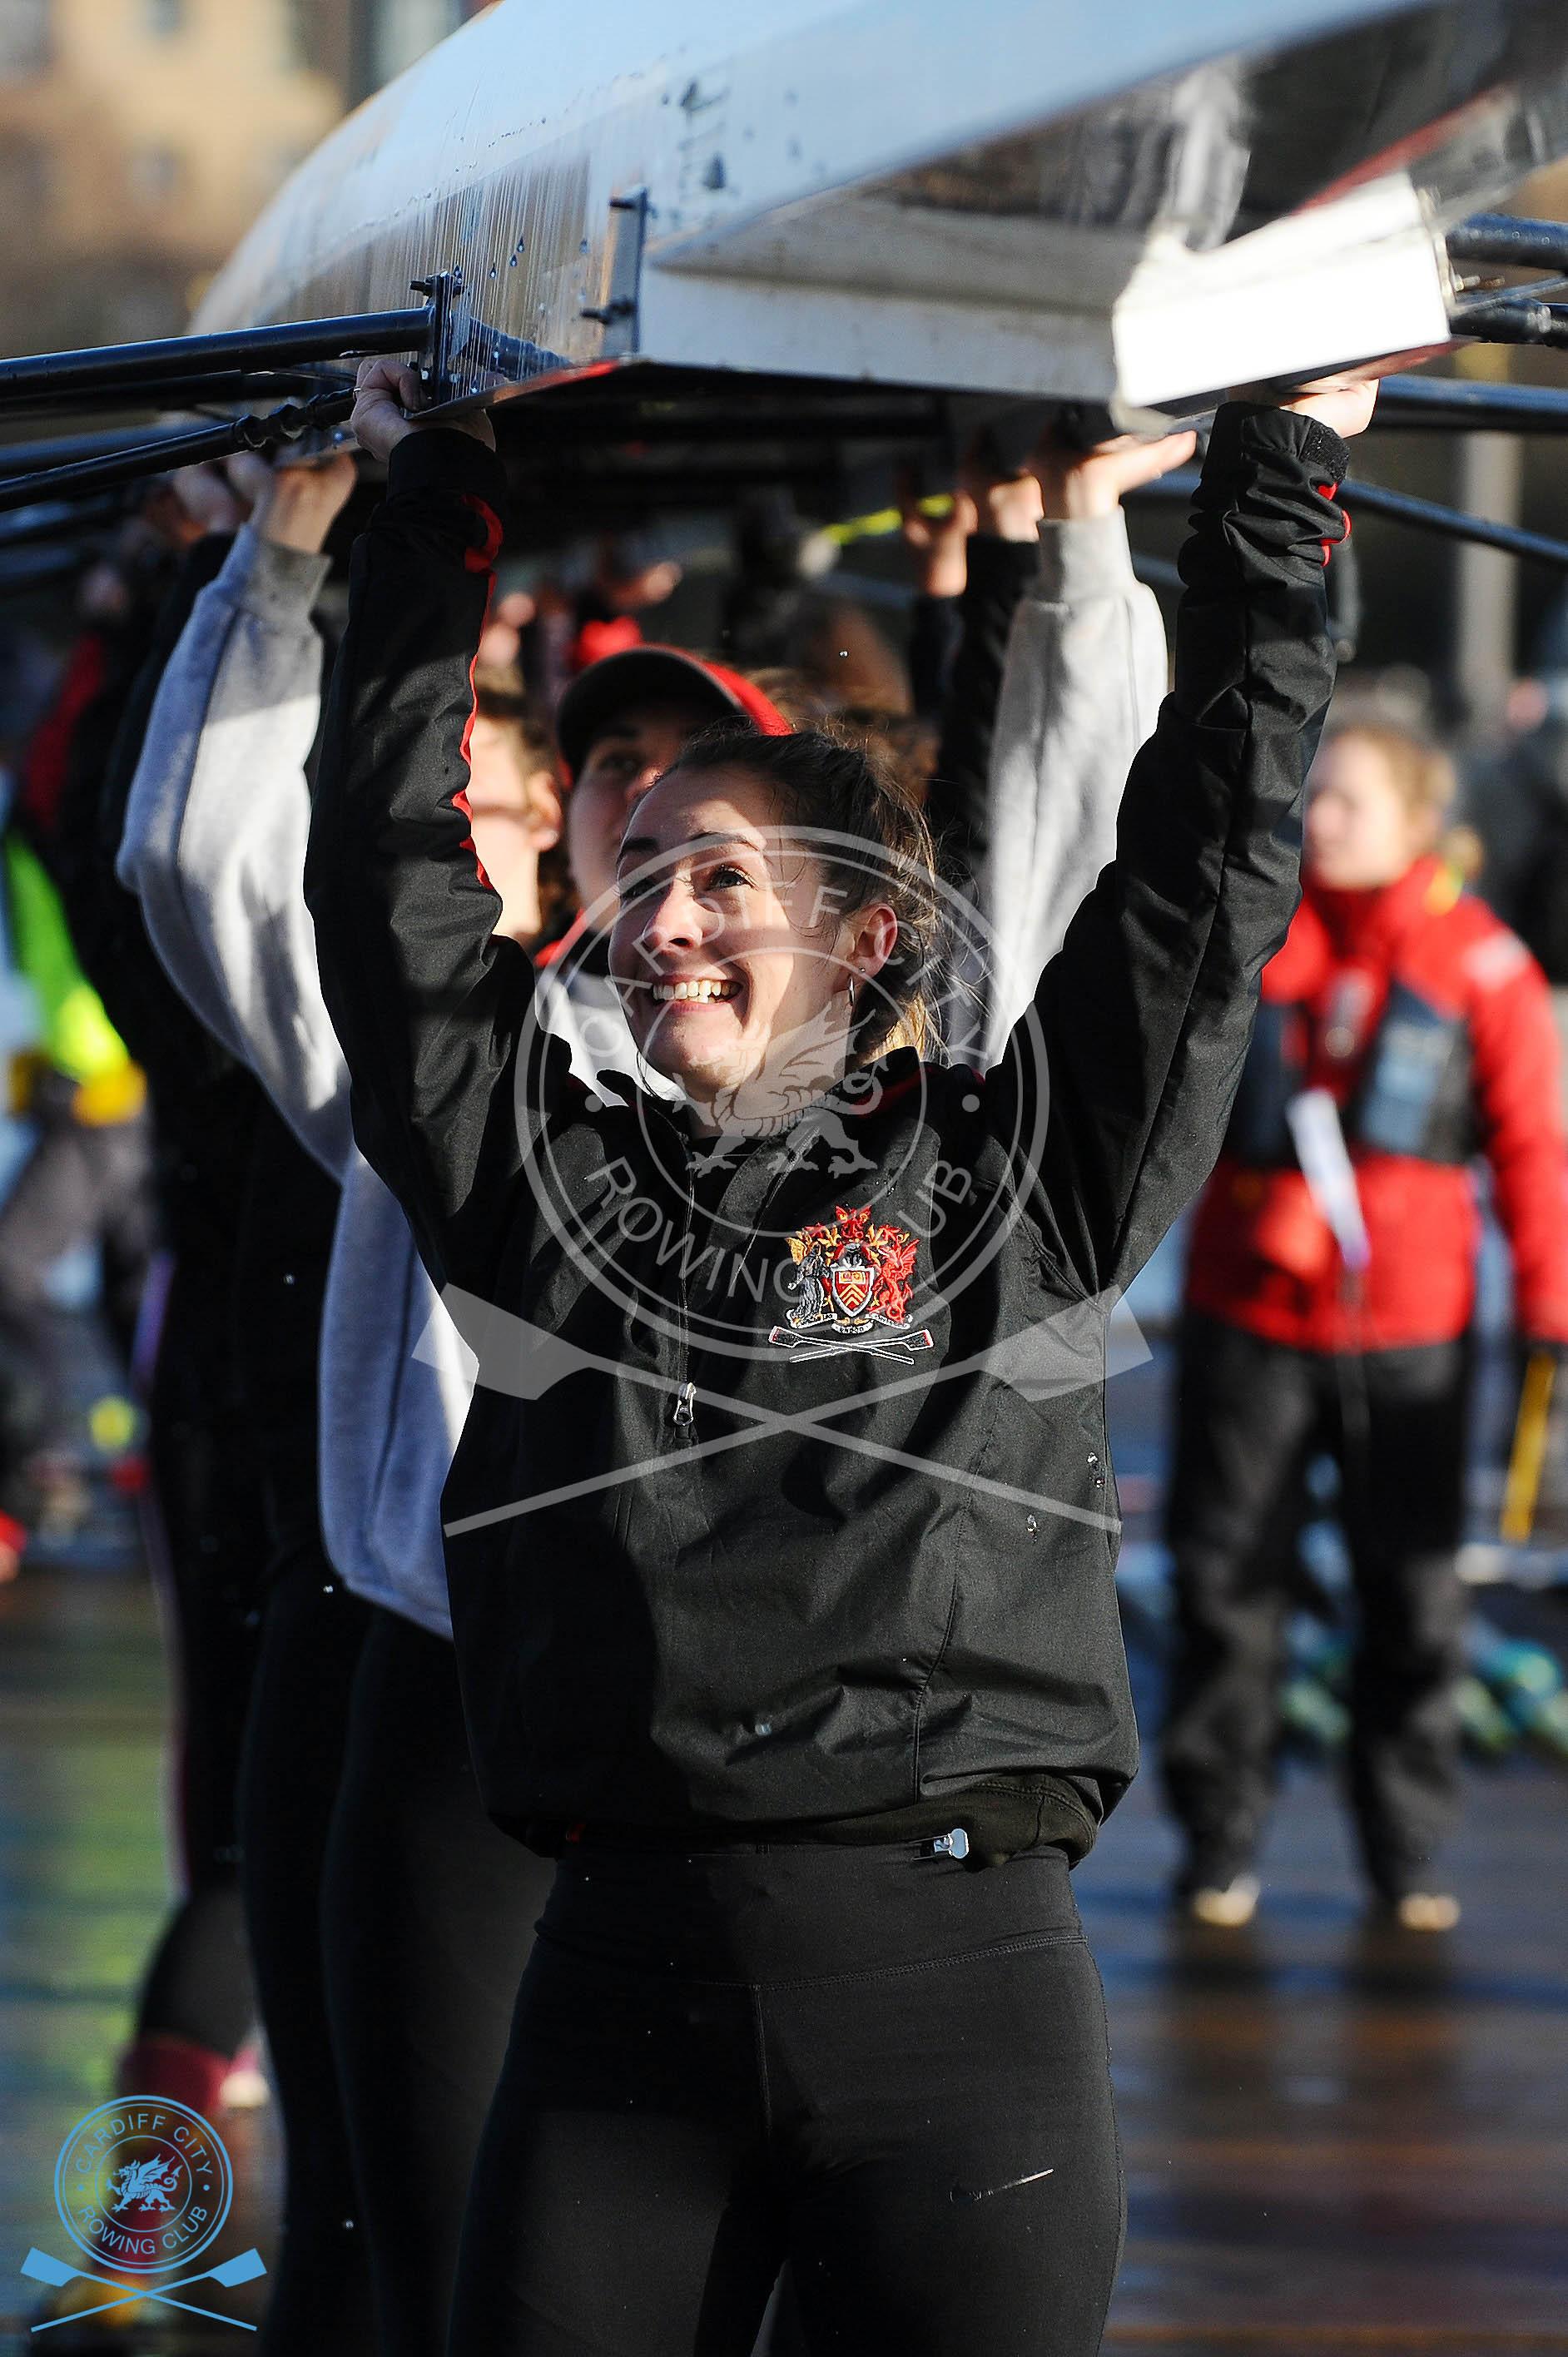 DW_280119_Cardiff_City_Rowing_355.jpg